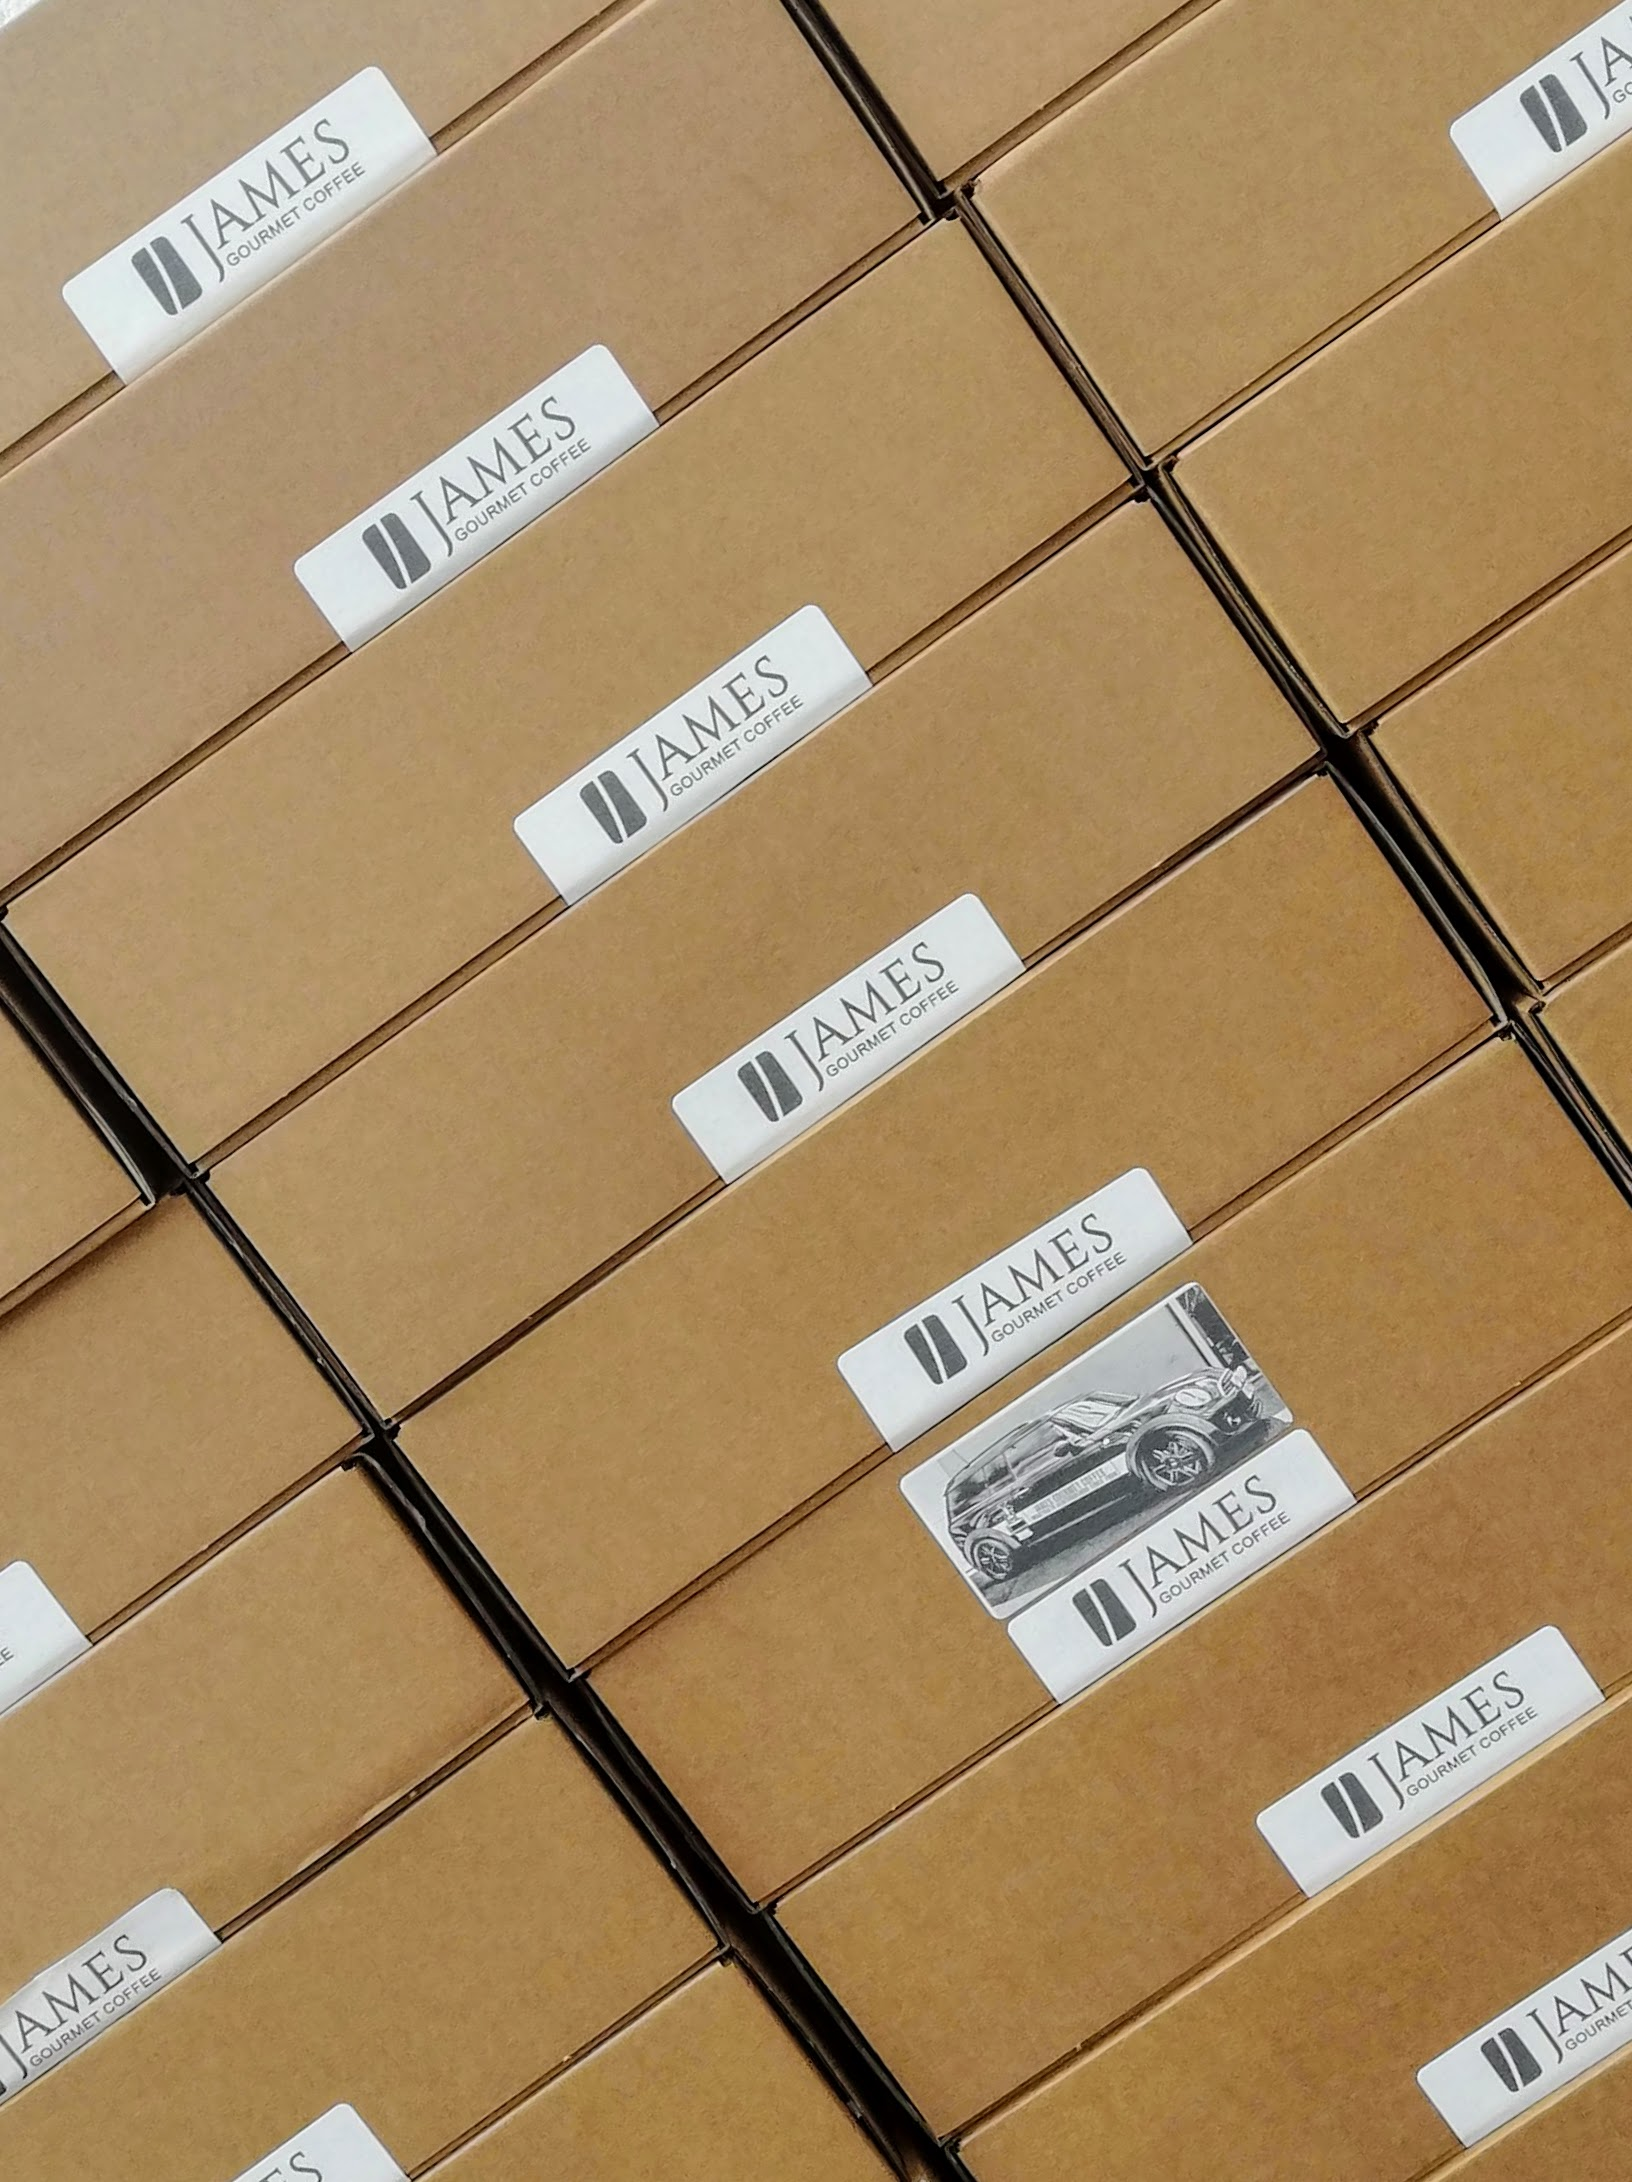 James Gourmet Post Boxes